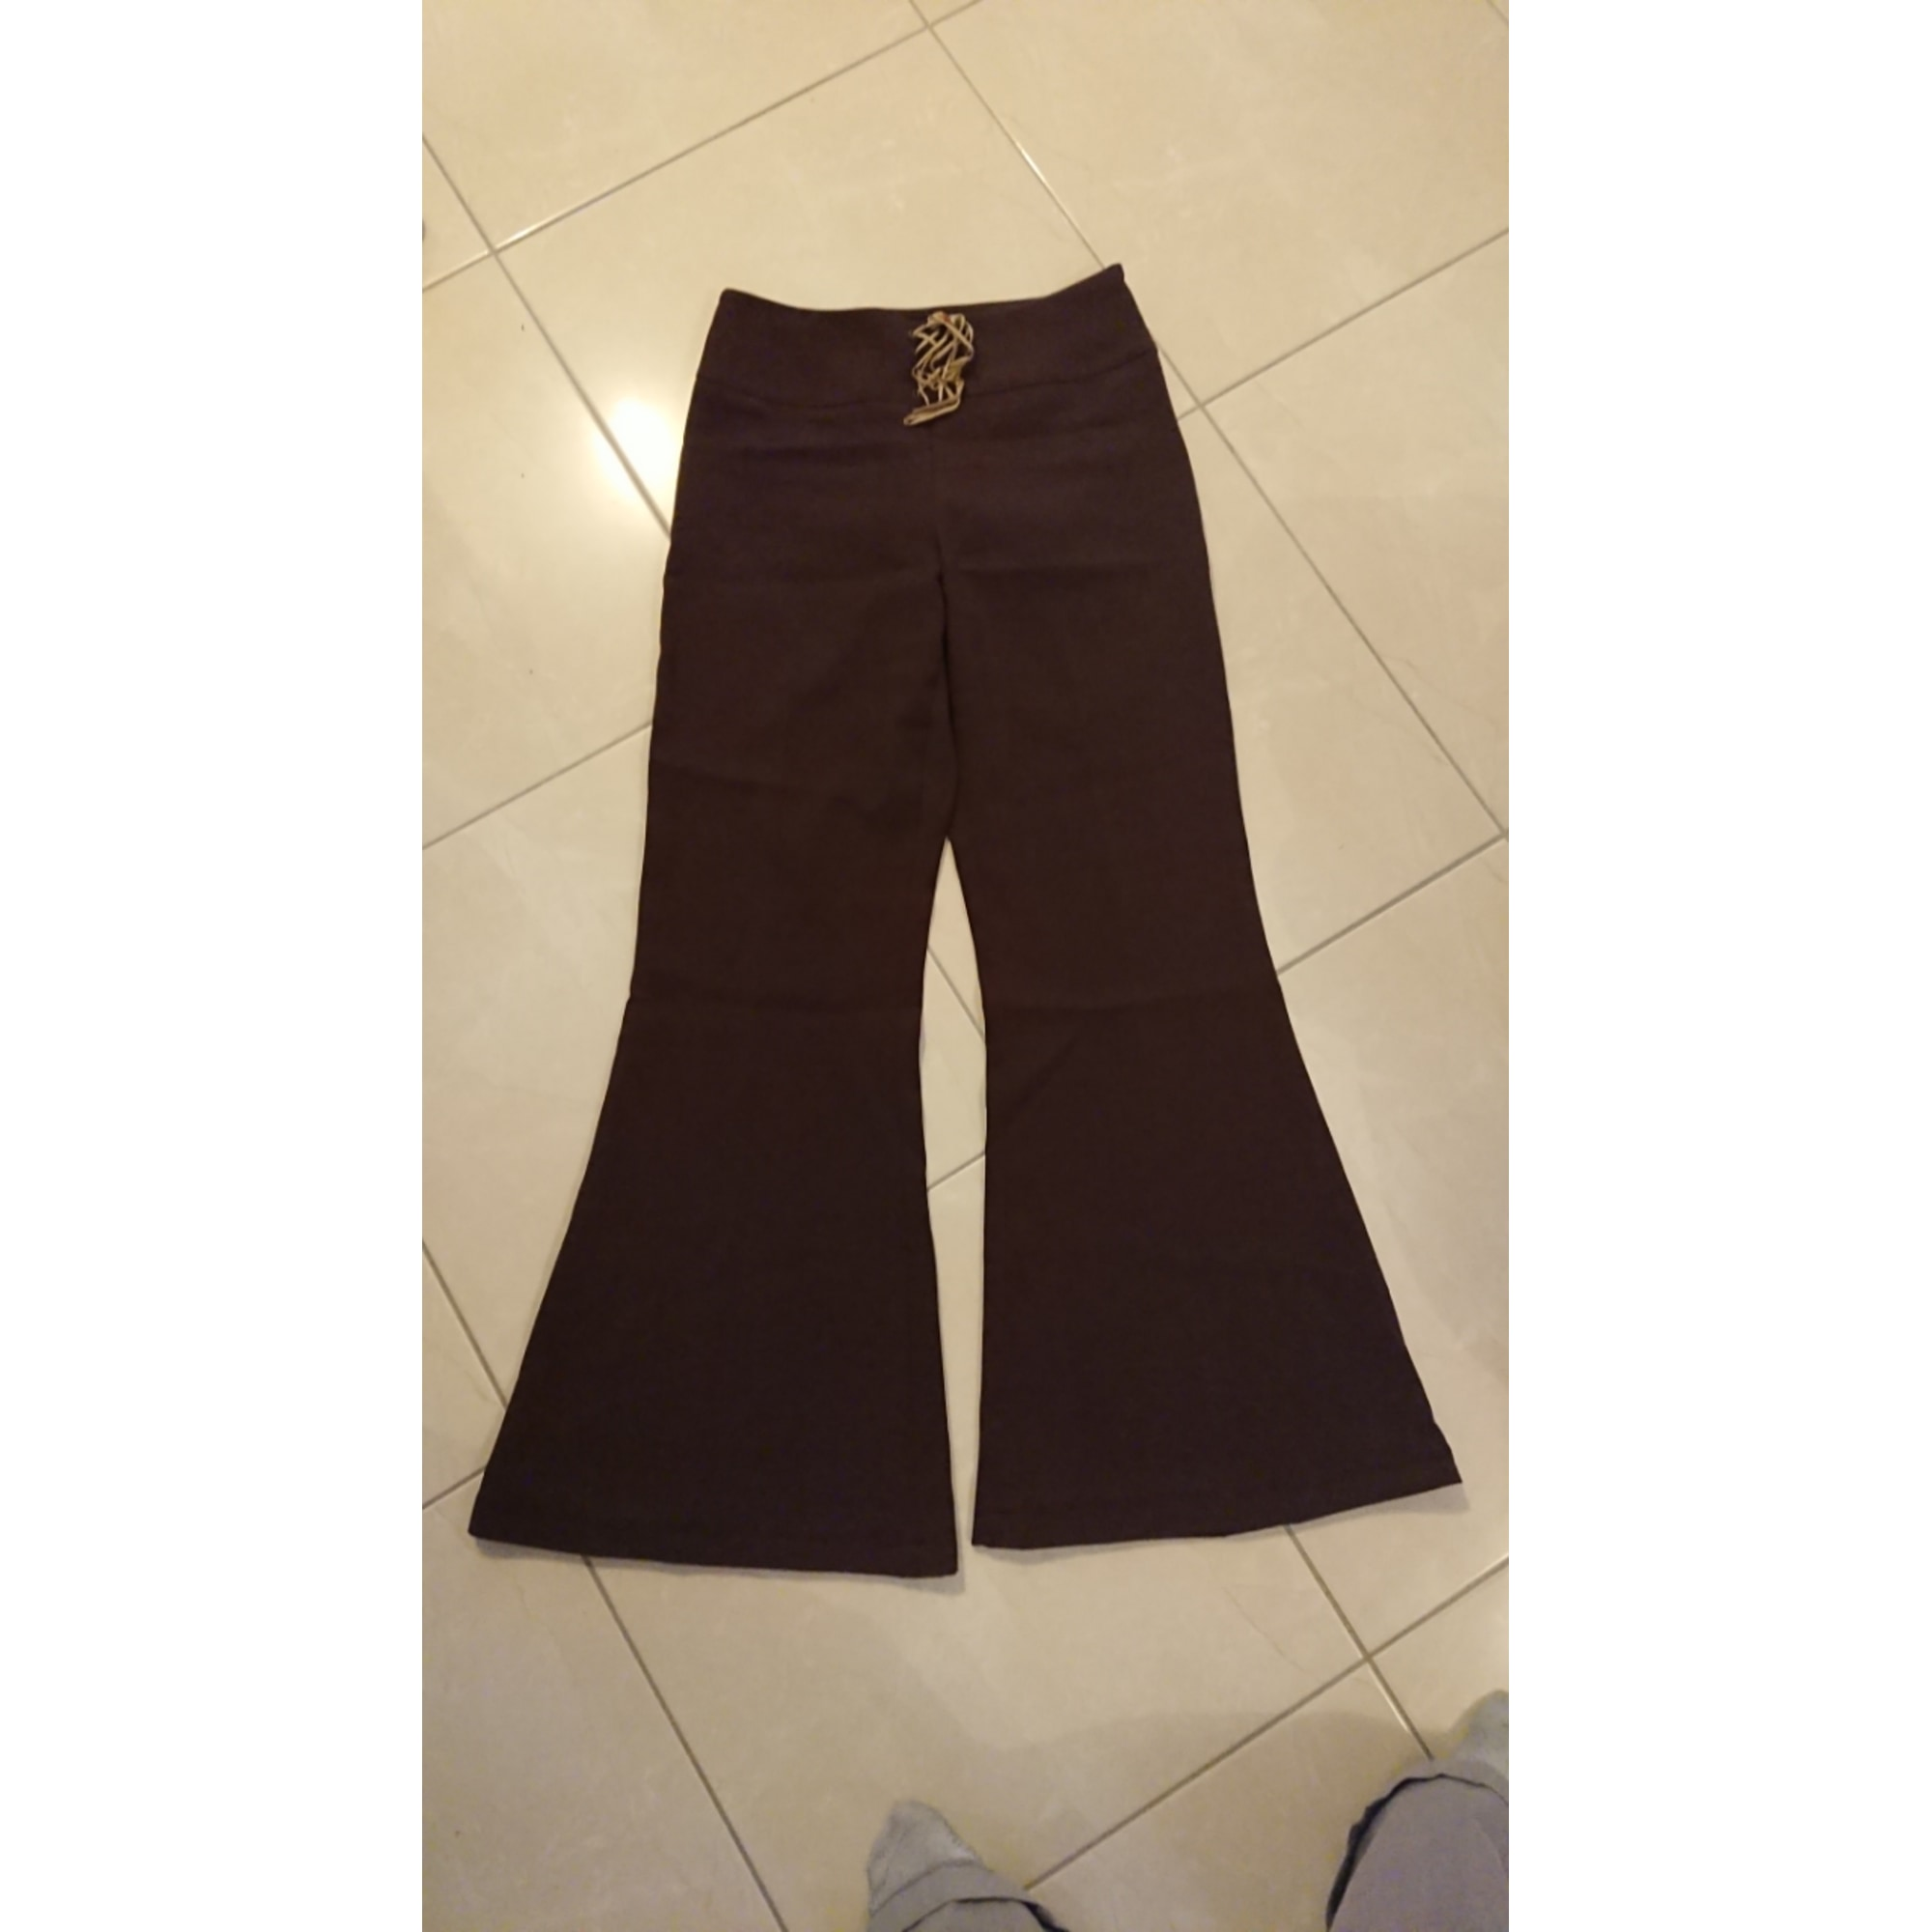 Pantalon évasé LA REDOUTE Marron